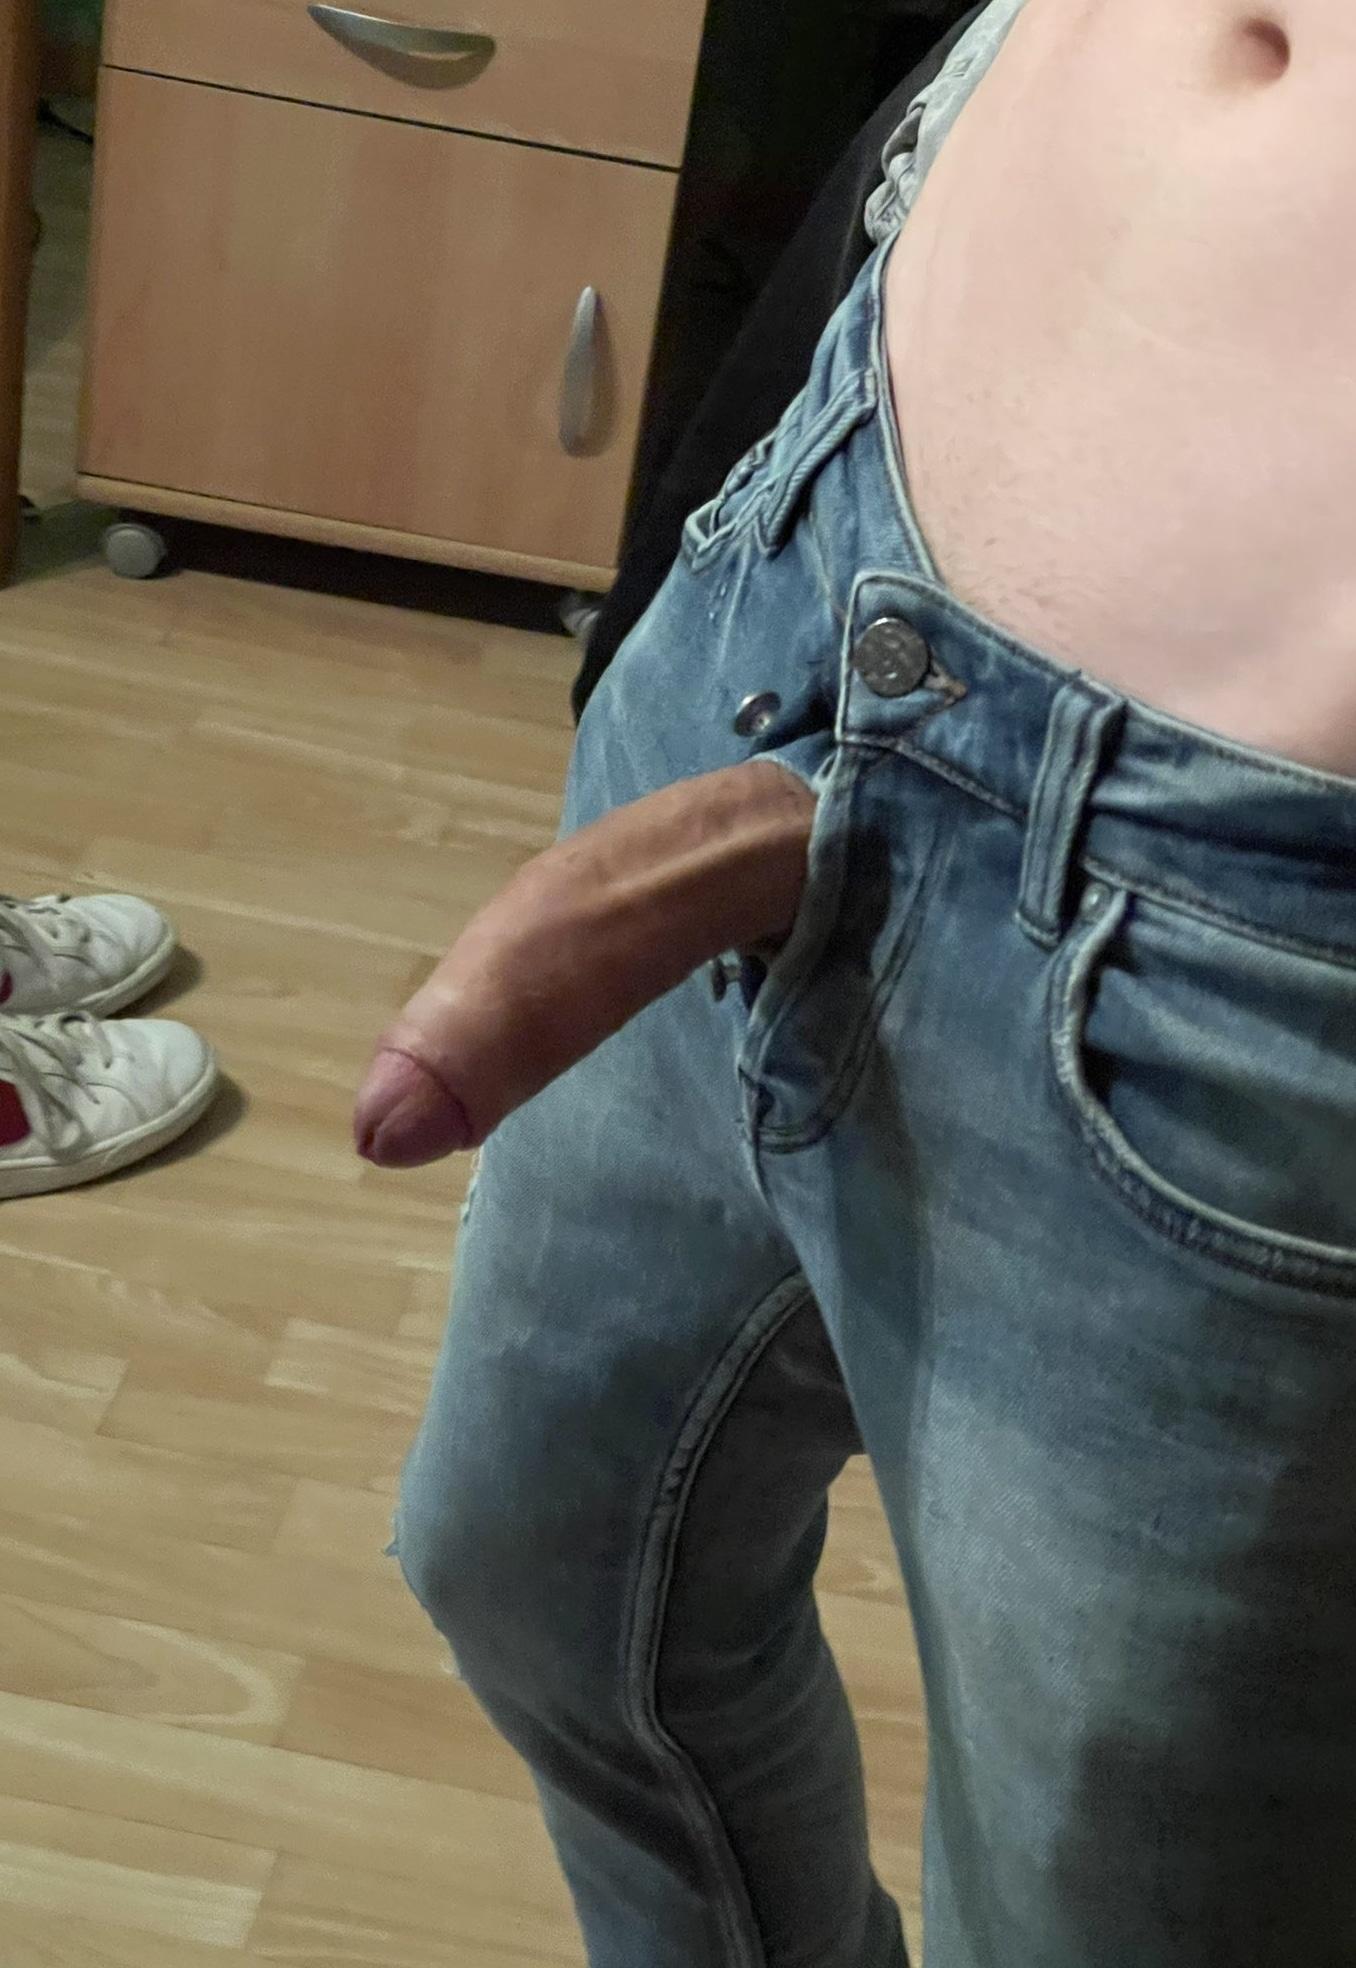 Boner out of jeans